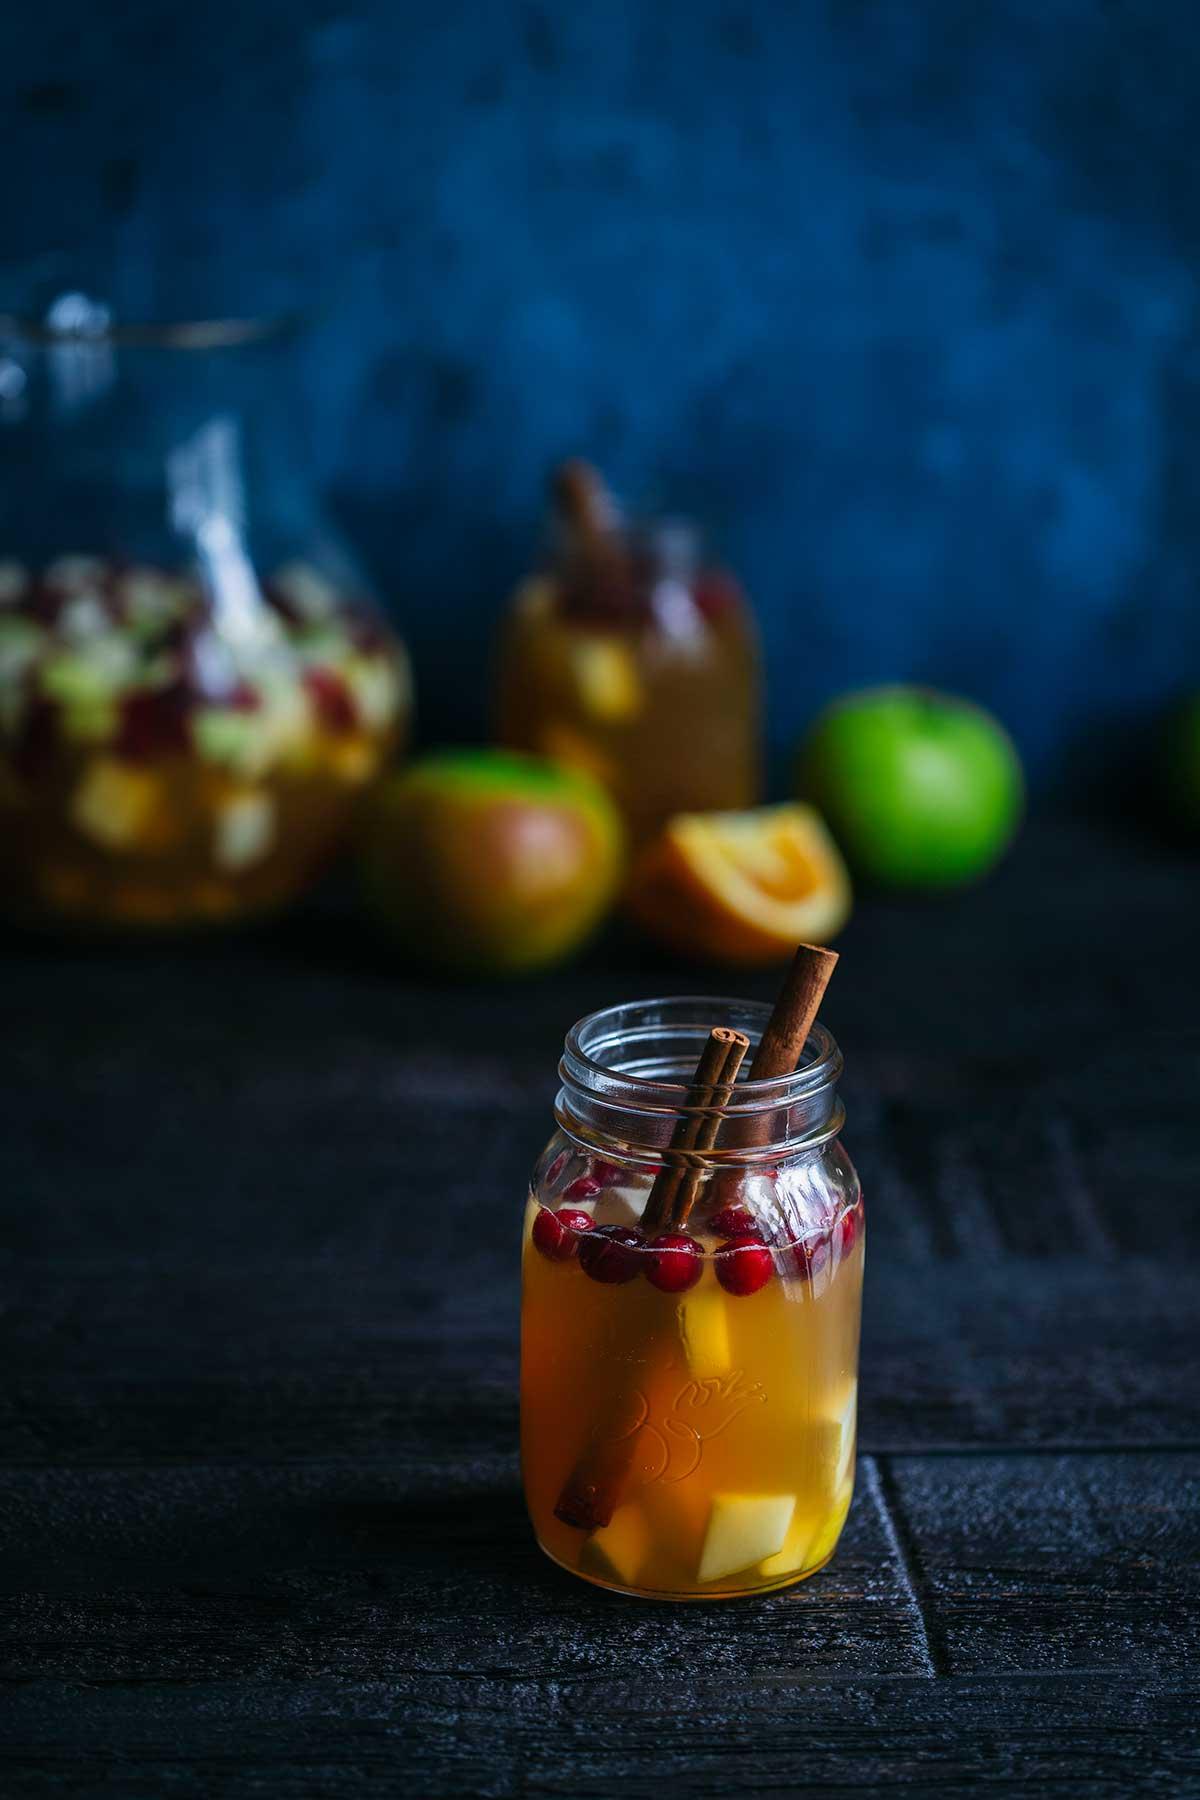 Apple cider sangria in a mason jar, garnished with cinnamon sticks